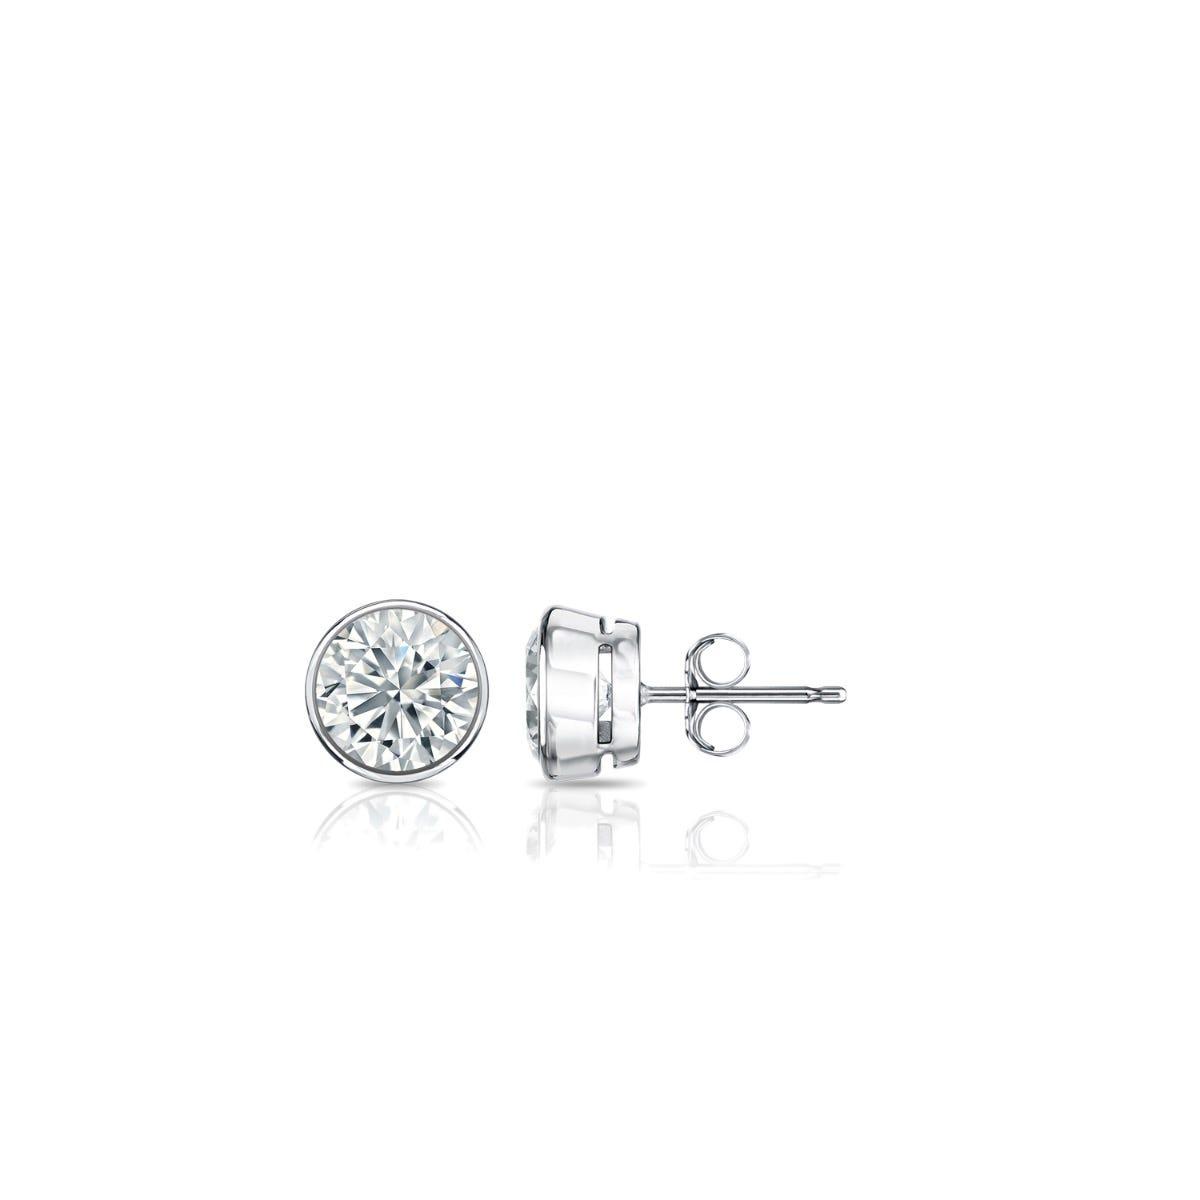 Diamond Round Bezel-Set 1/5ctw. Solitaire Stud (IJ-SI2) Earrings in 18K White Gold